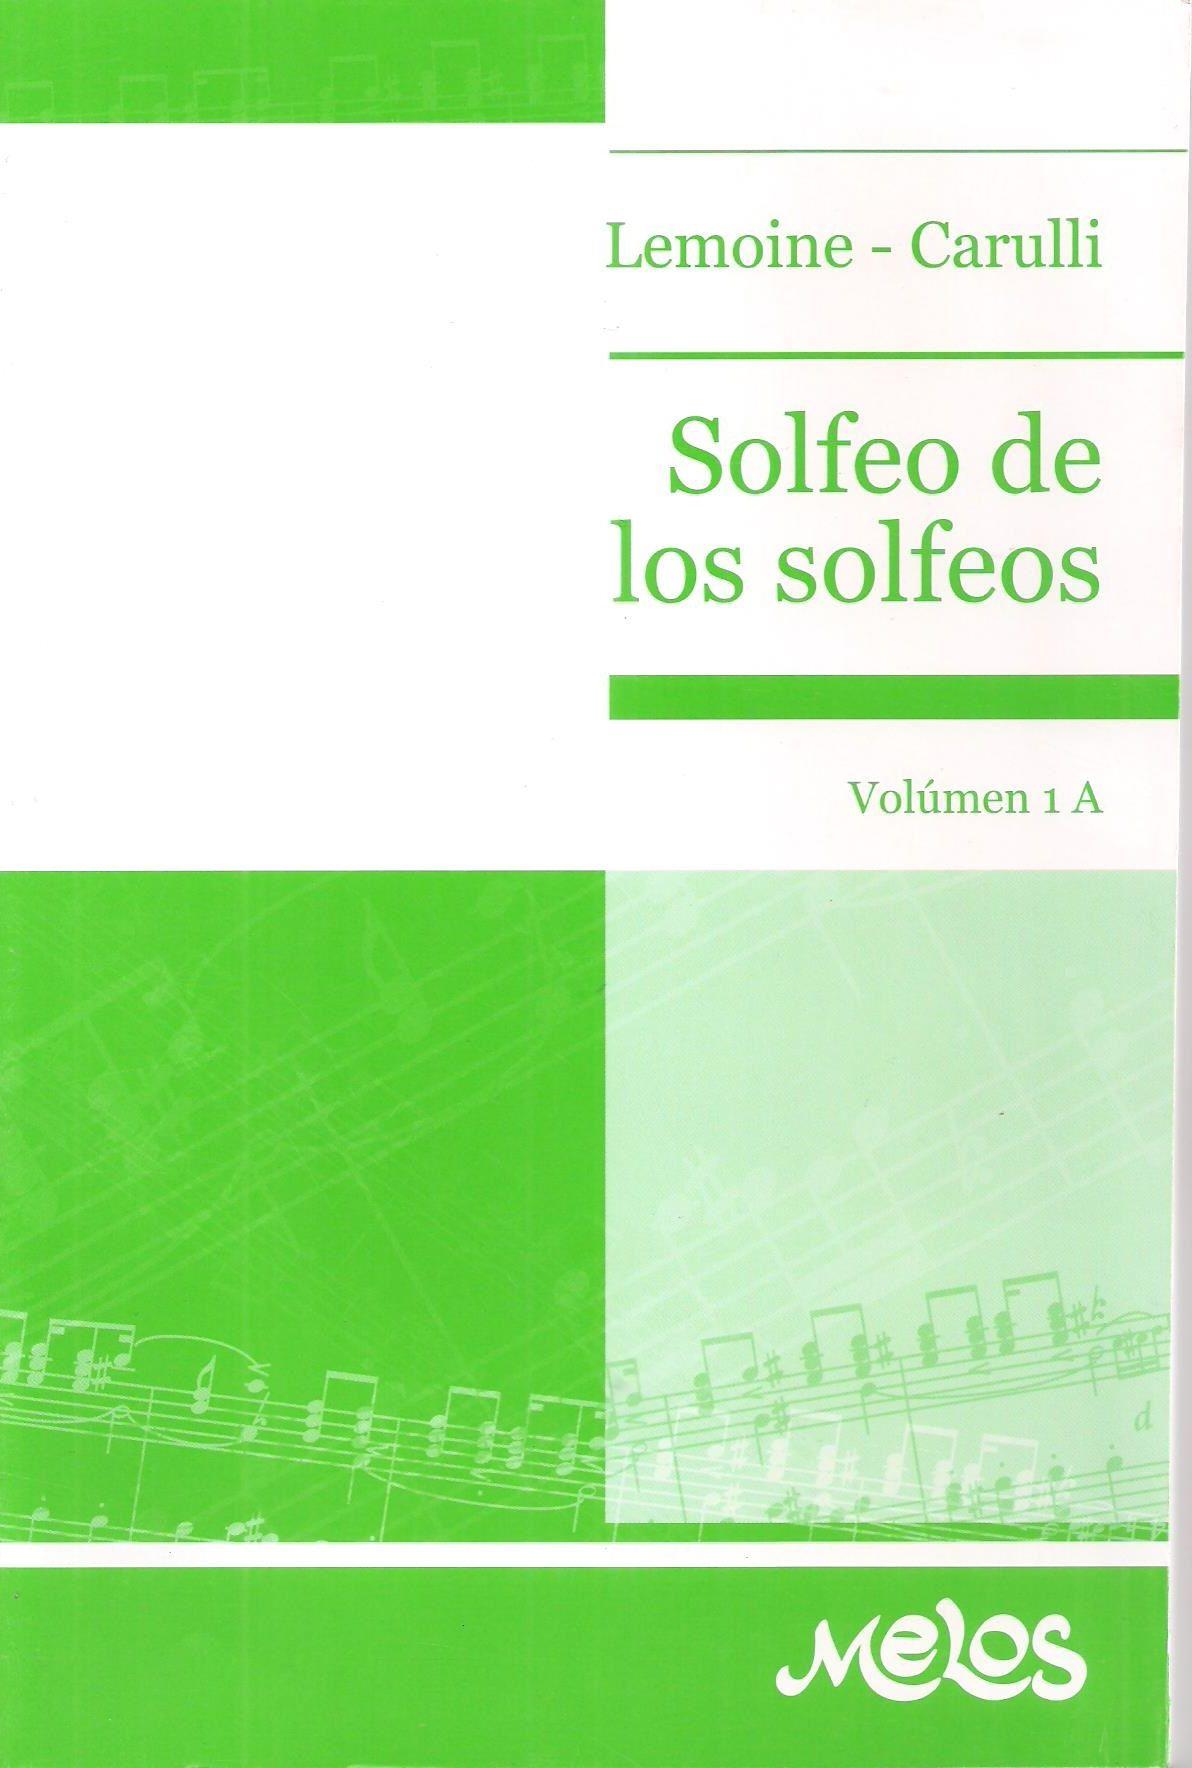 SOLFEO SOLFEOS 1A LEMOINE CARULLI PDF